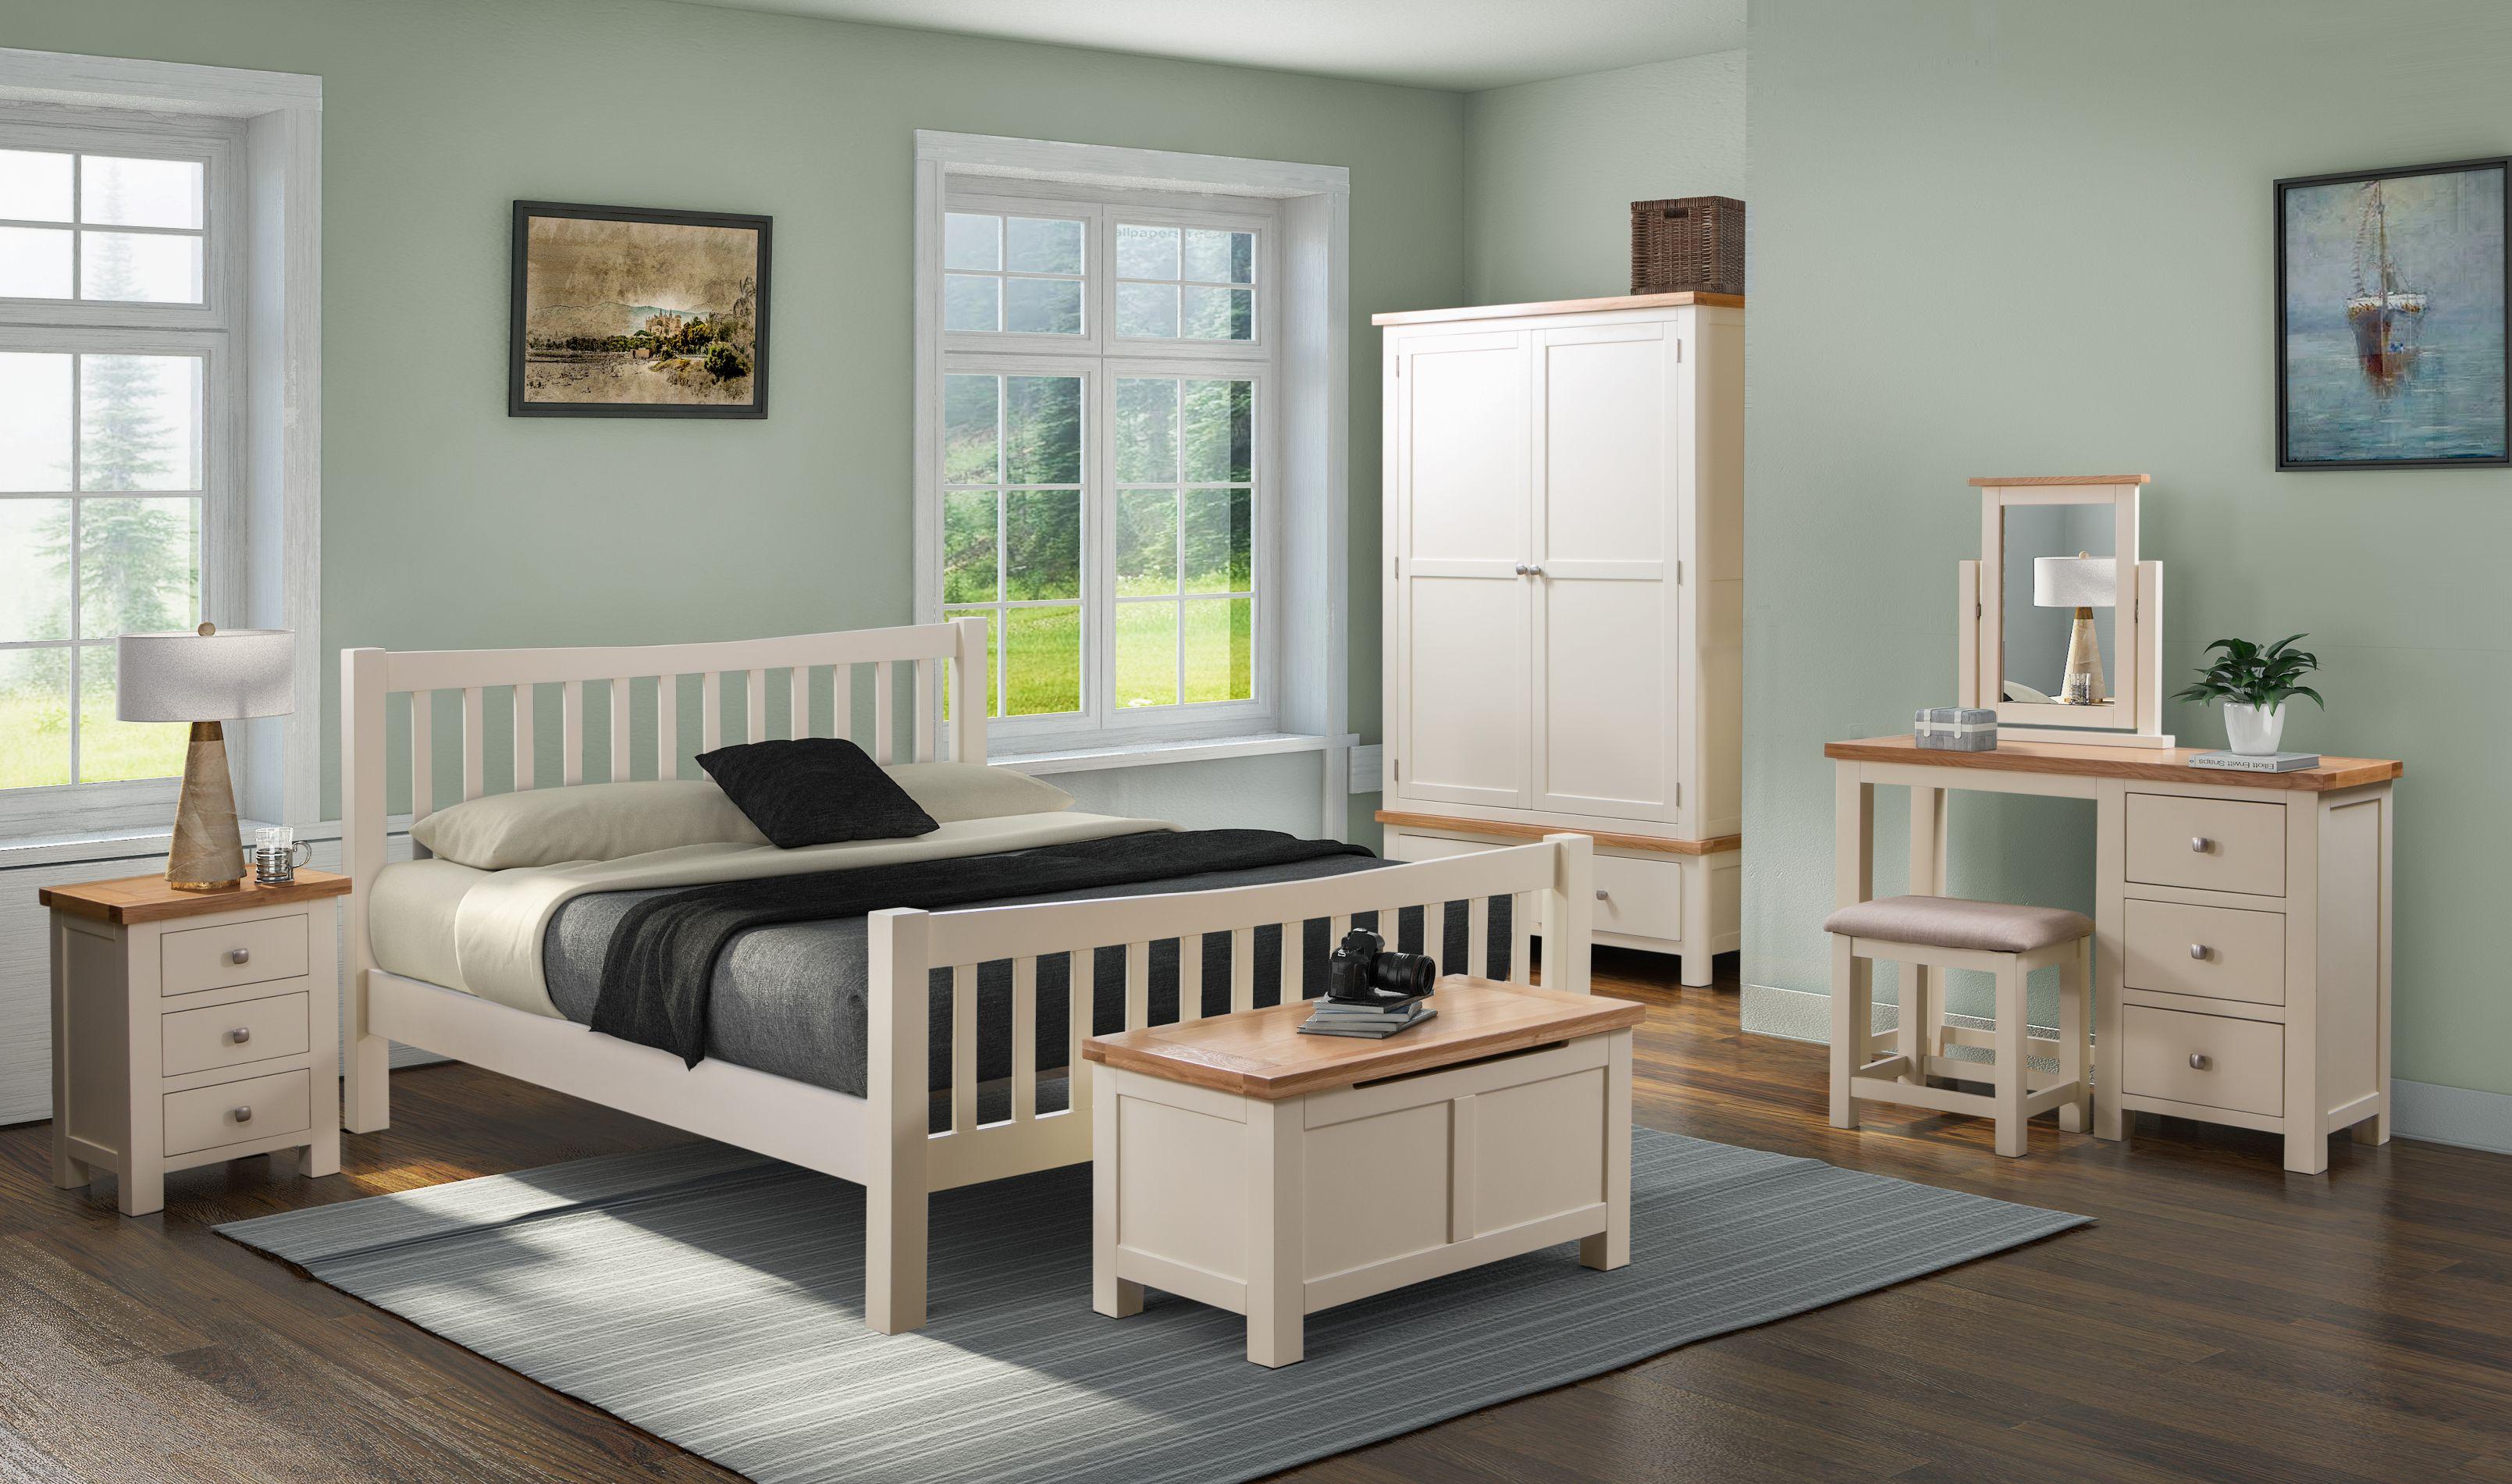 Devonshire Pine - DORCHESTER PAINTED - Bedroom